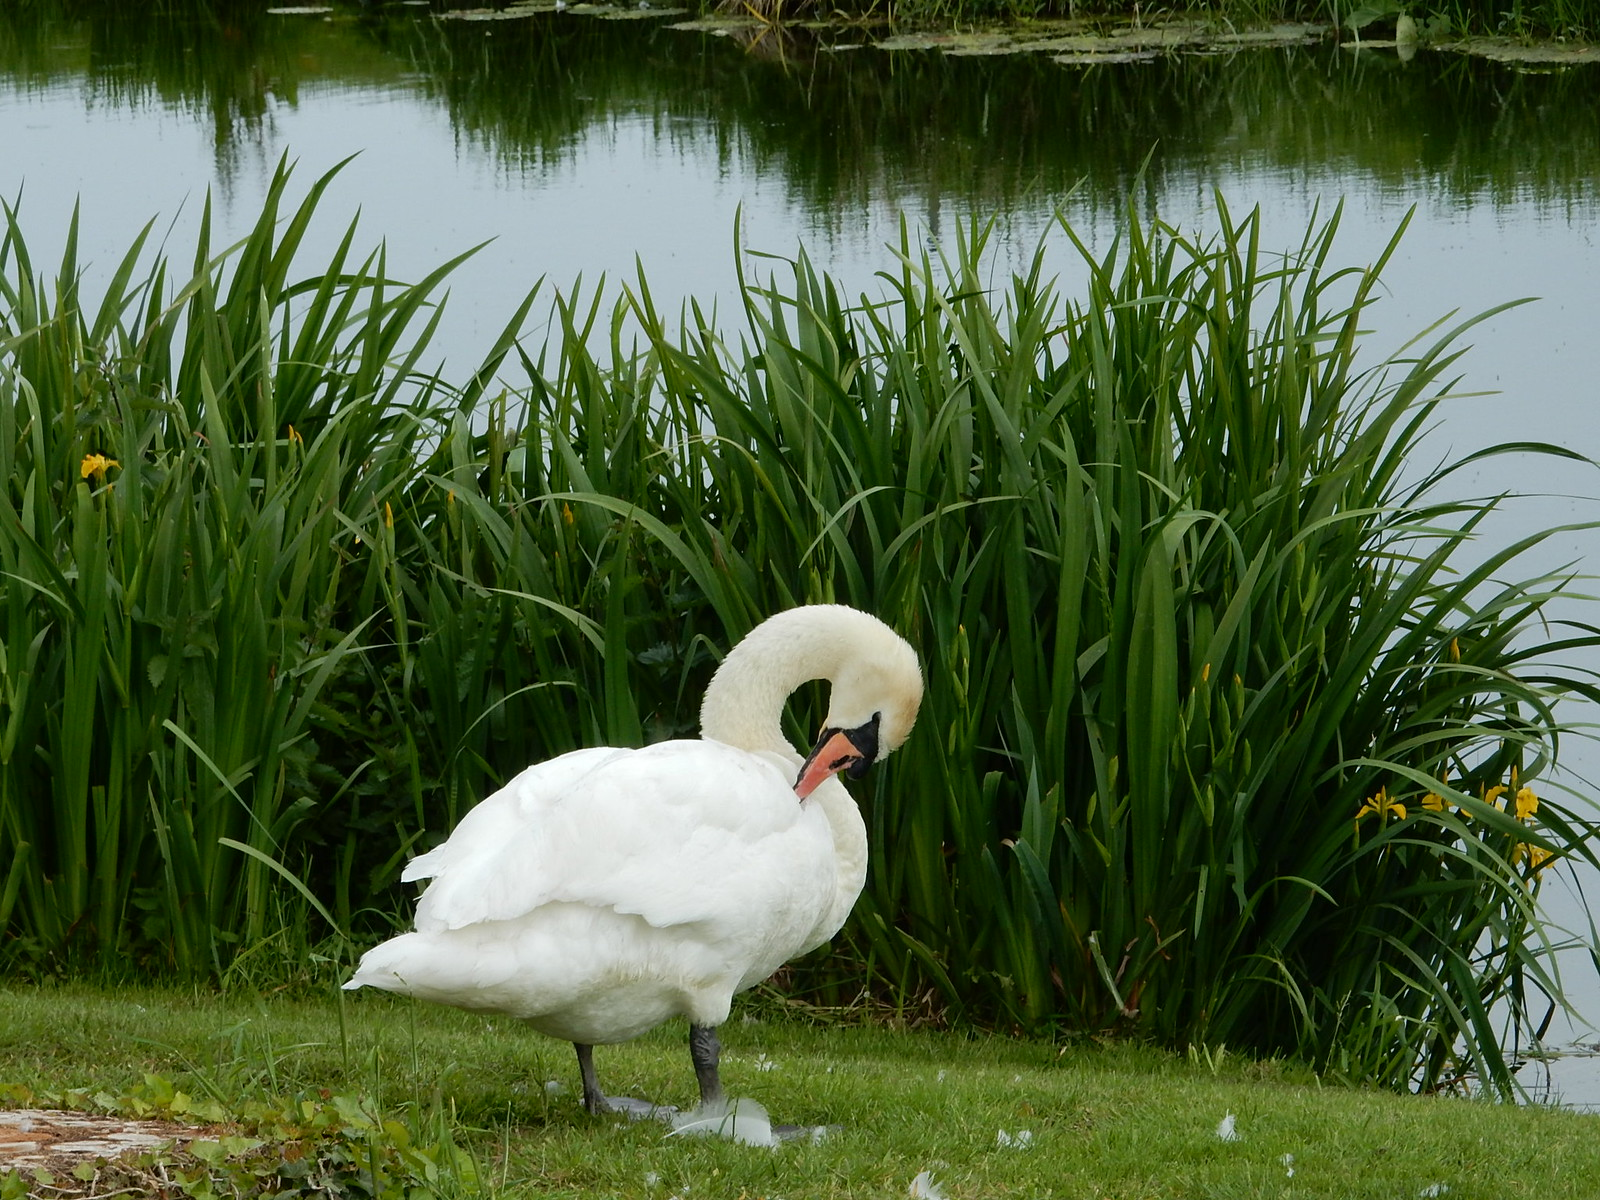 Swan at the Henny Swan.Bures to Sudbury